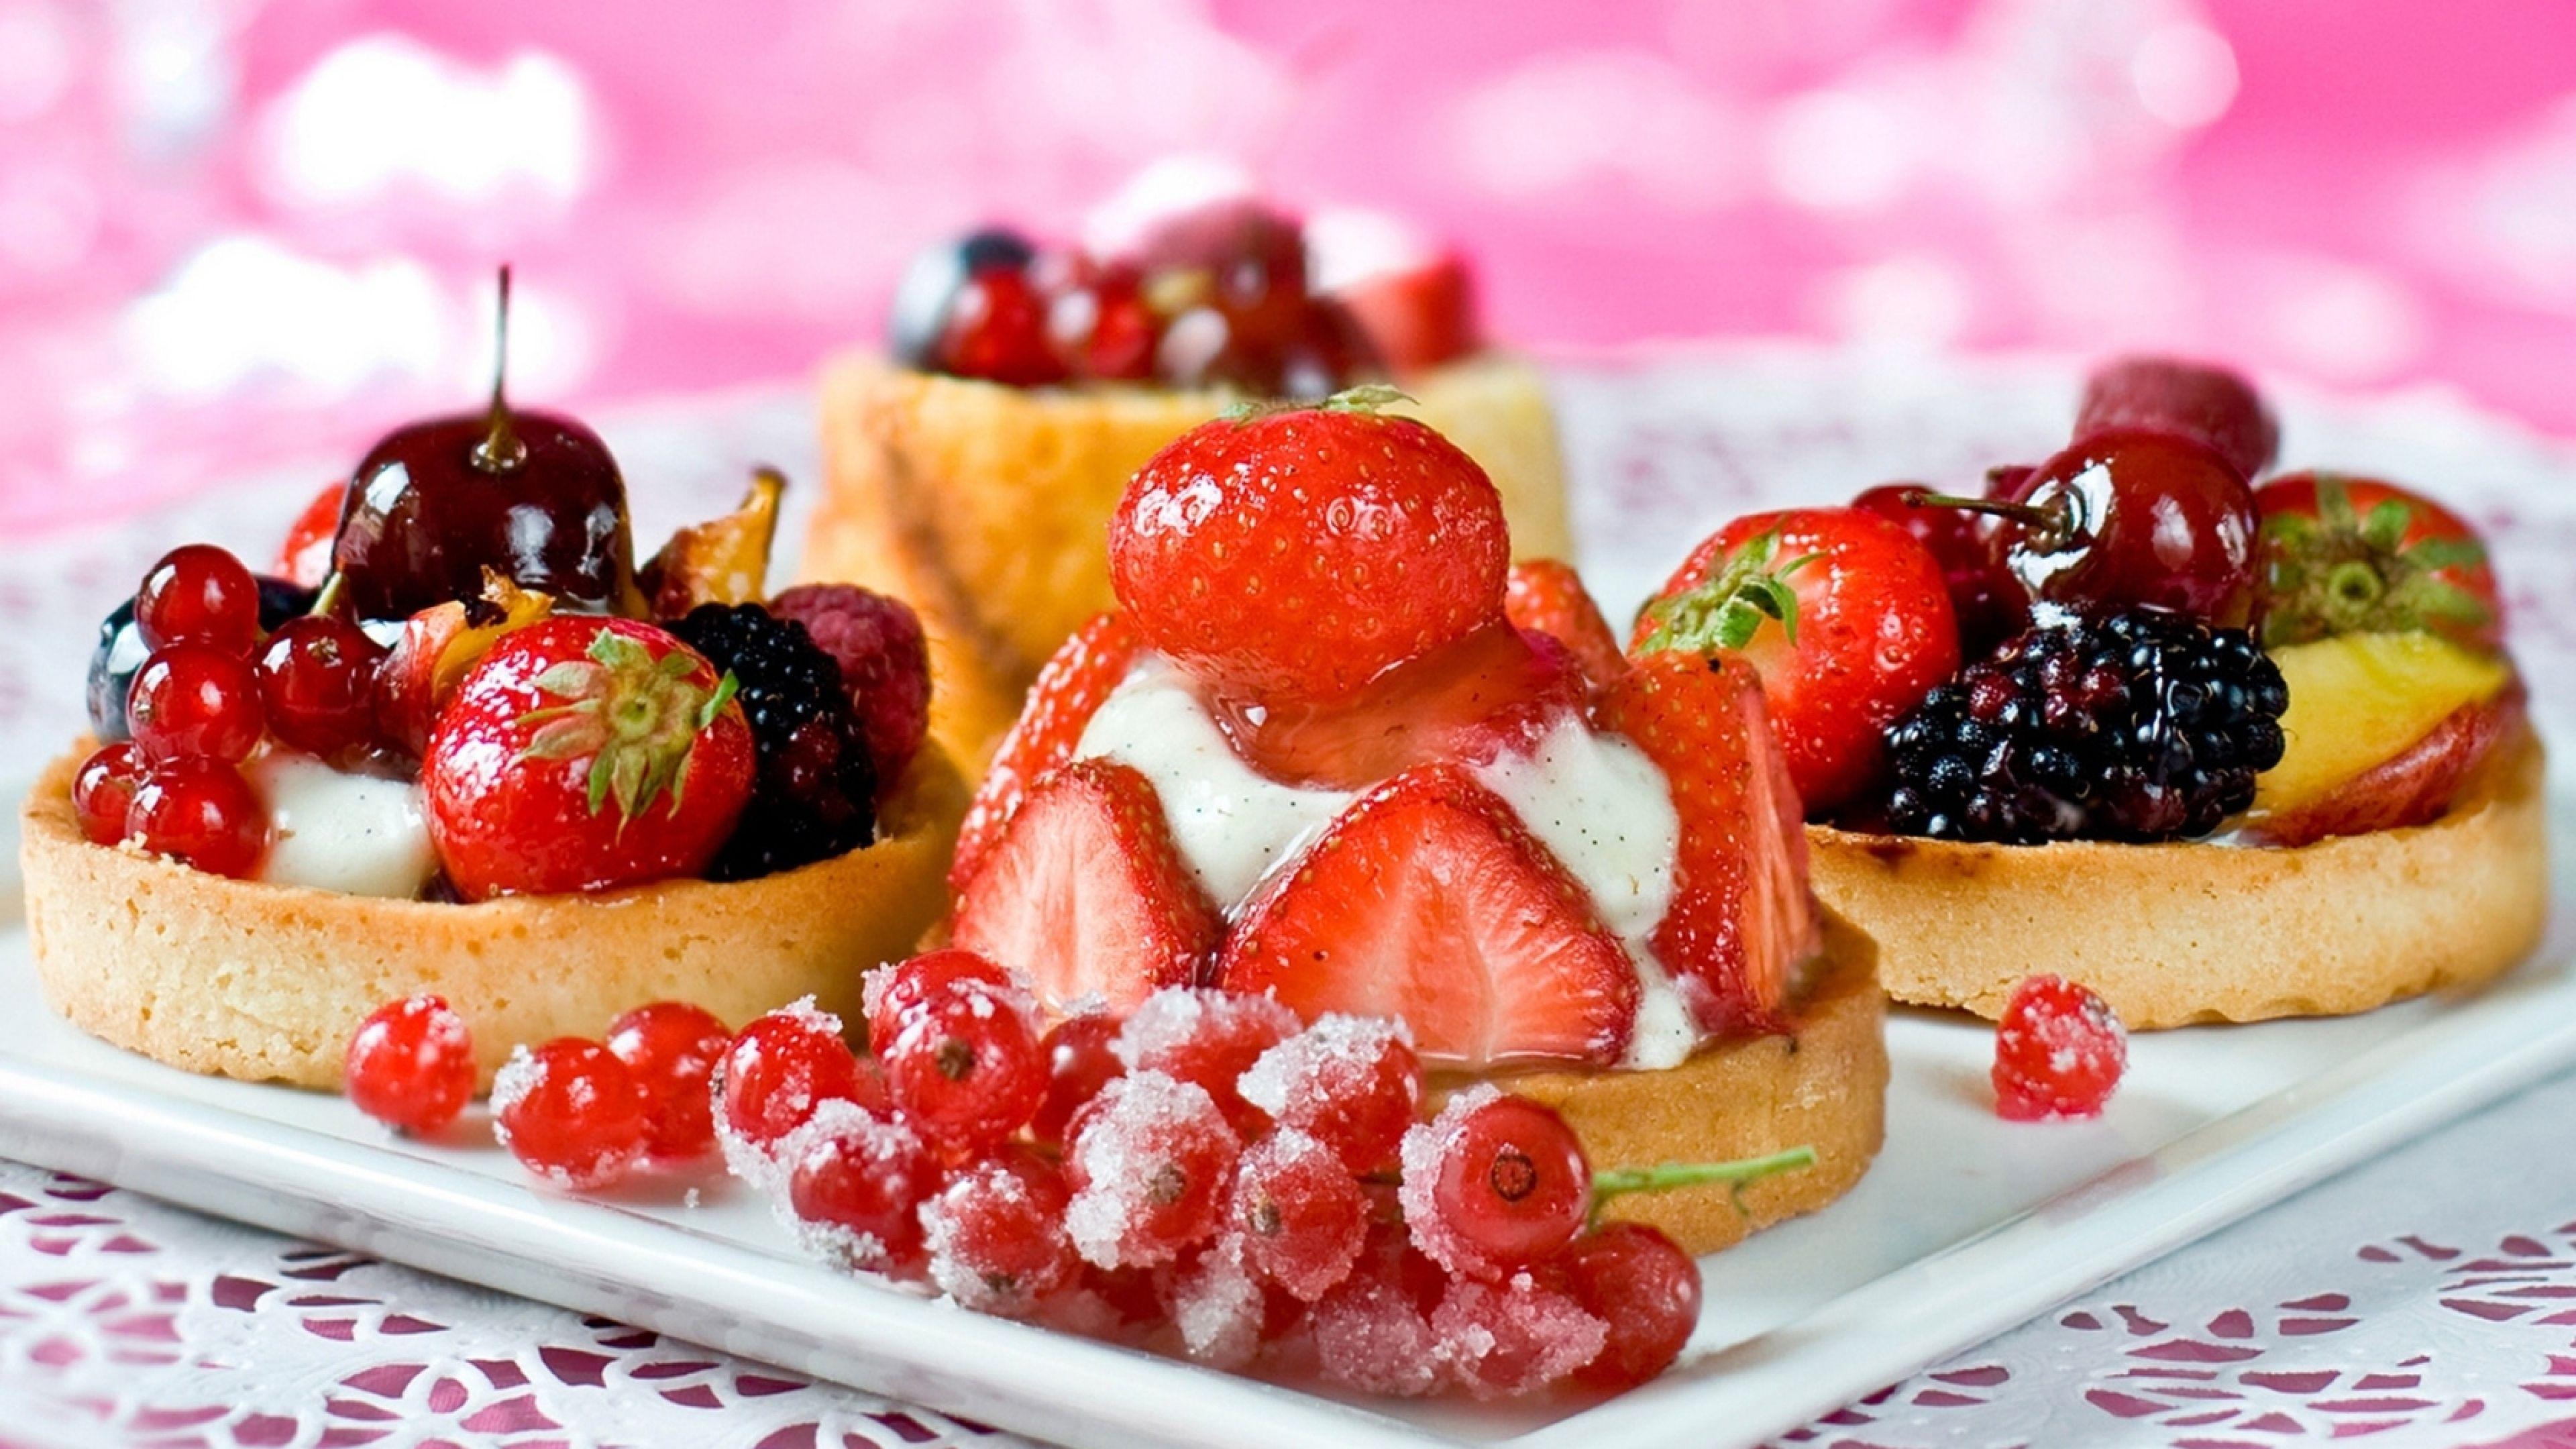 sweet desserts - Google Search